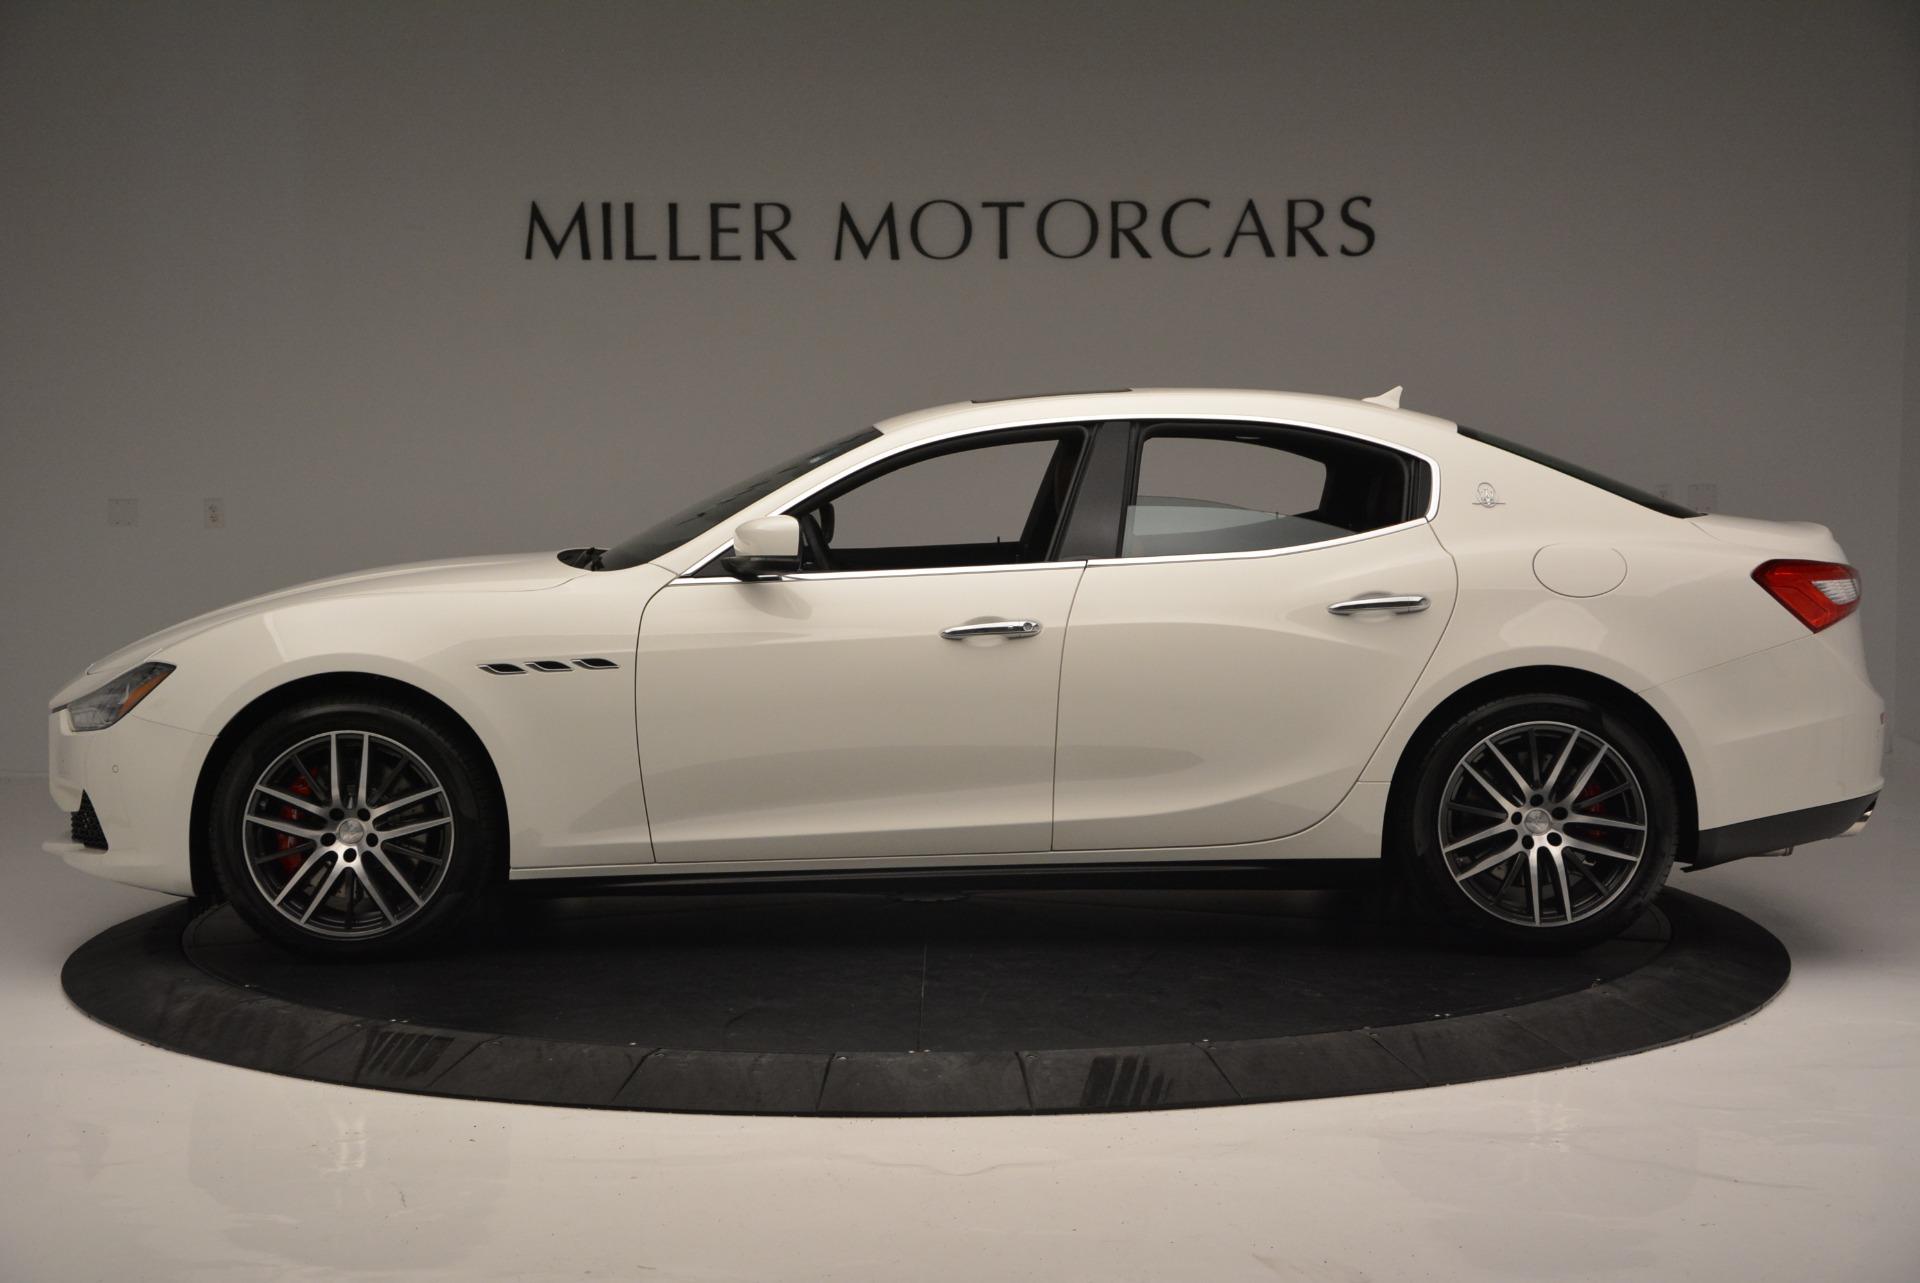 Used 2017 Maserati Ghibli S Q4 Ex-Loaner For Sale In Greenwich, CT 719_p3